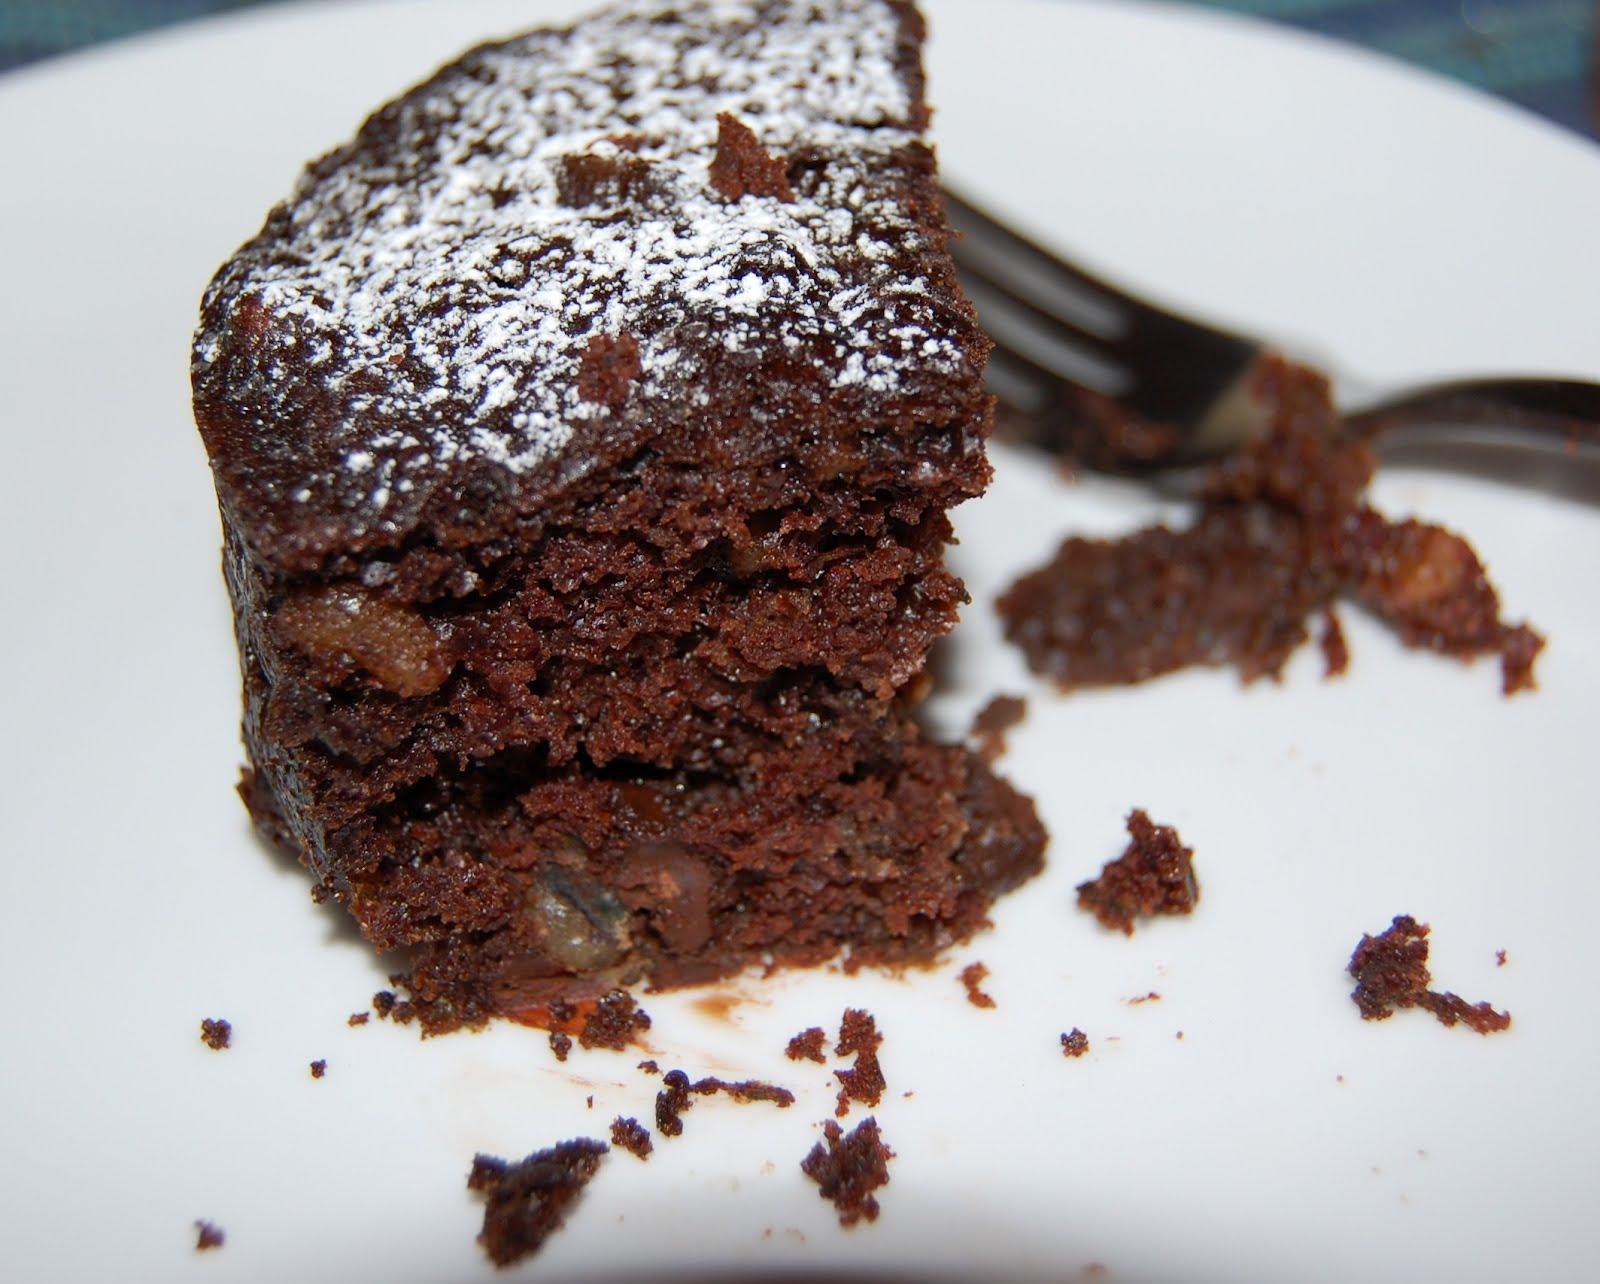 KnitOne,PearlOnion: Chocolate Zucchini Cake